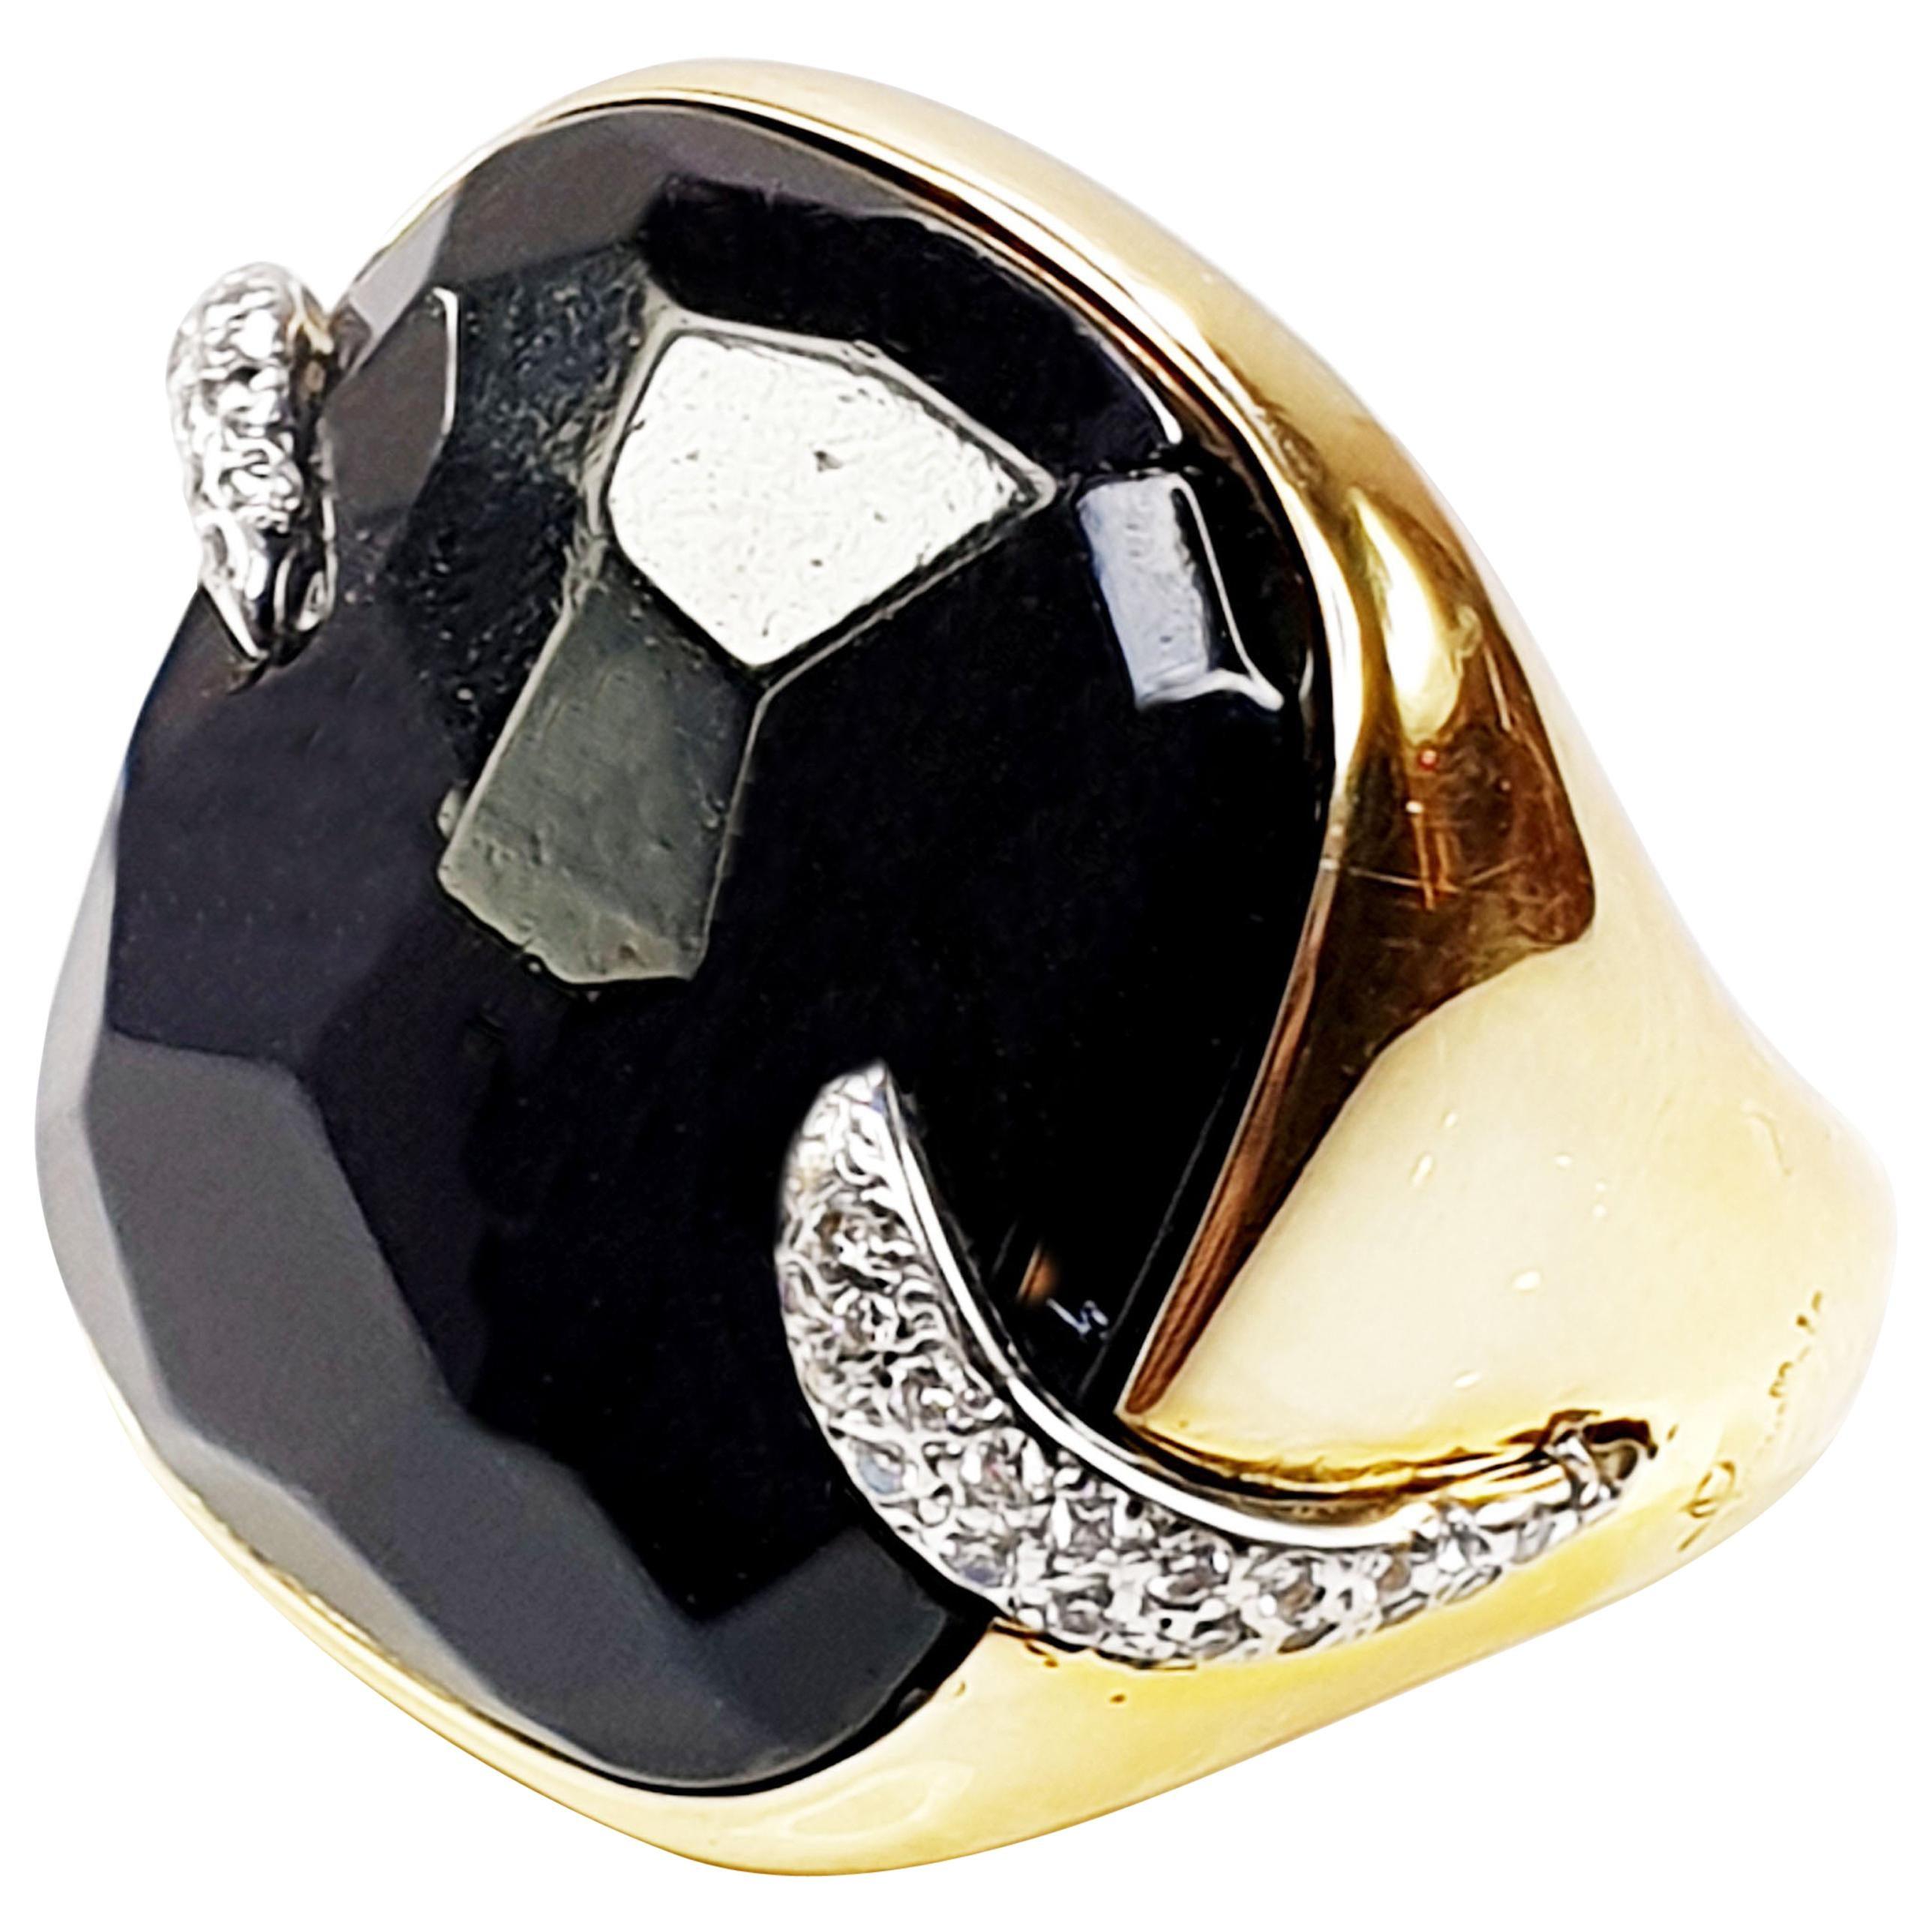 Pomellato Victoria Black Jet and 18 Karat Gold and Diamond Ring